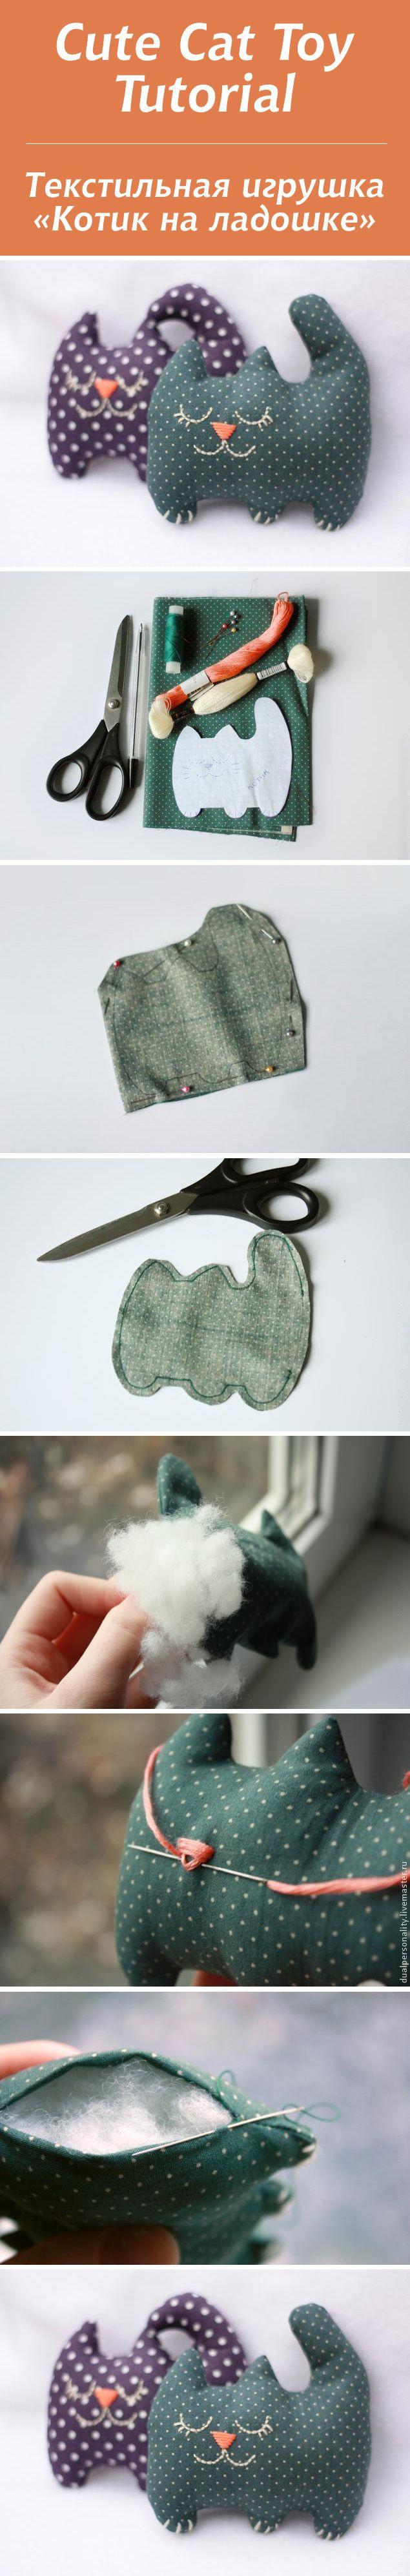 "Текстильная игрушка ""Котик на ладошке"" / Cute Cat Toy Tutorial #toy #tutorial"